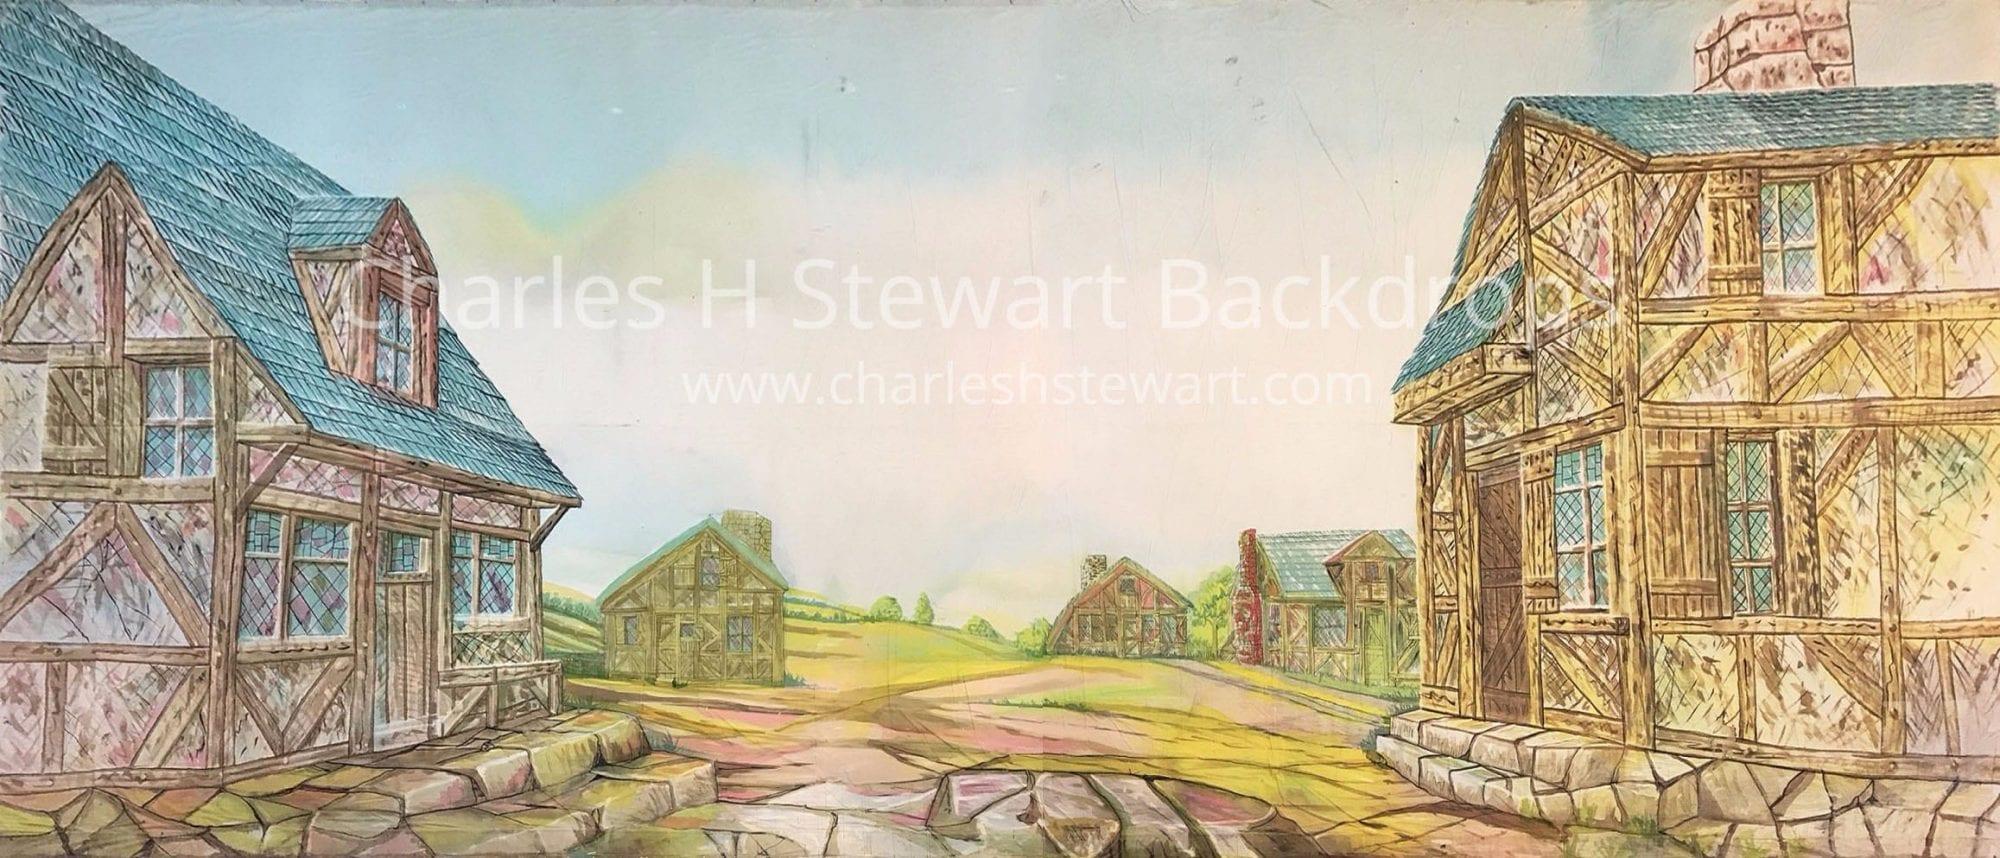 Old Village Street Backdrop Backdrops By Charles H Stewart